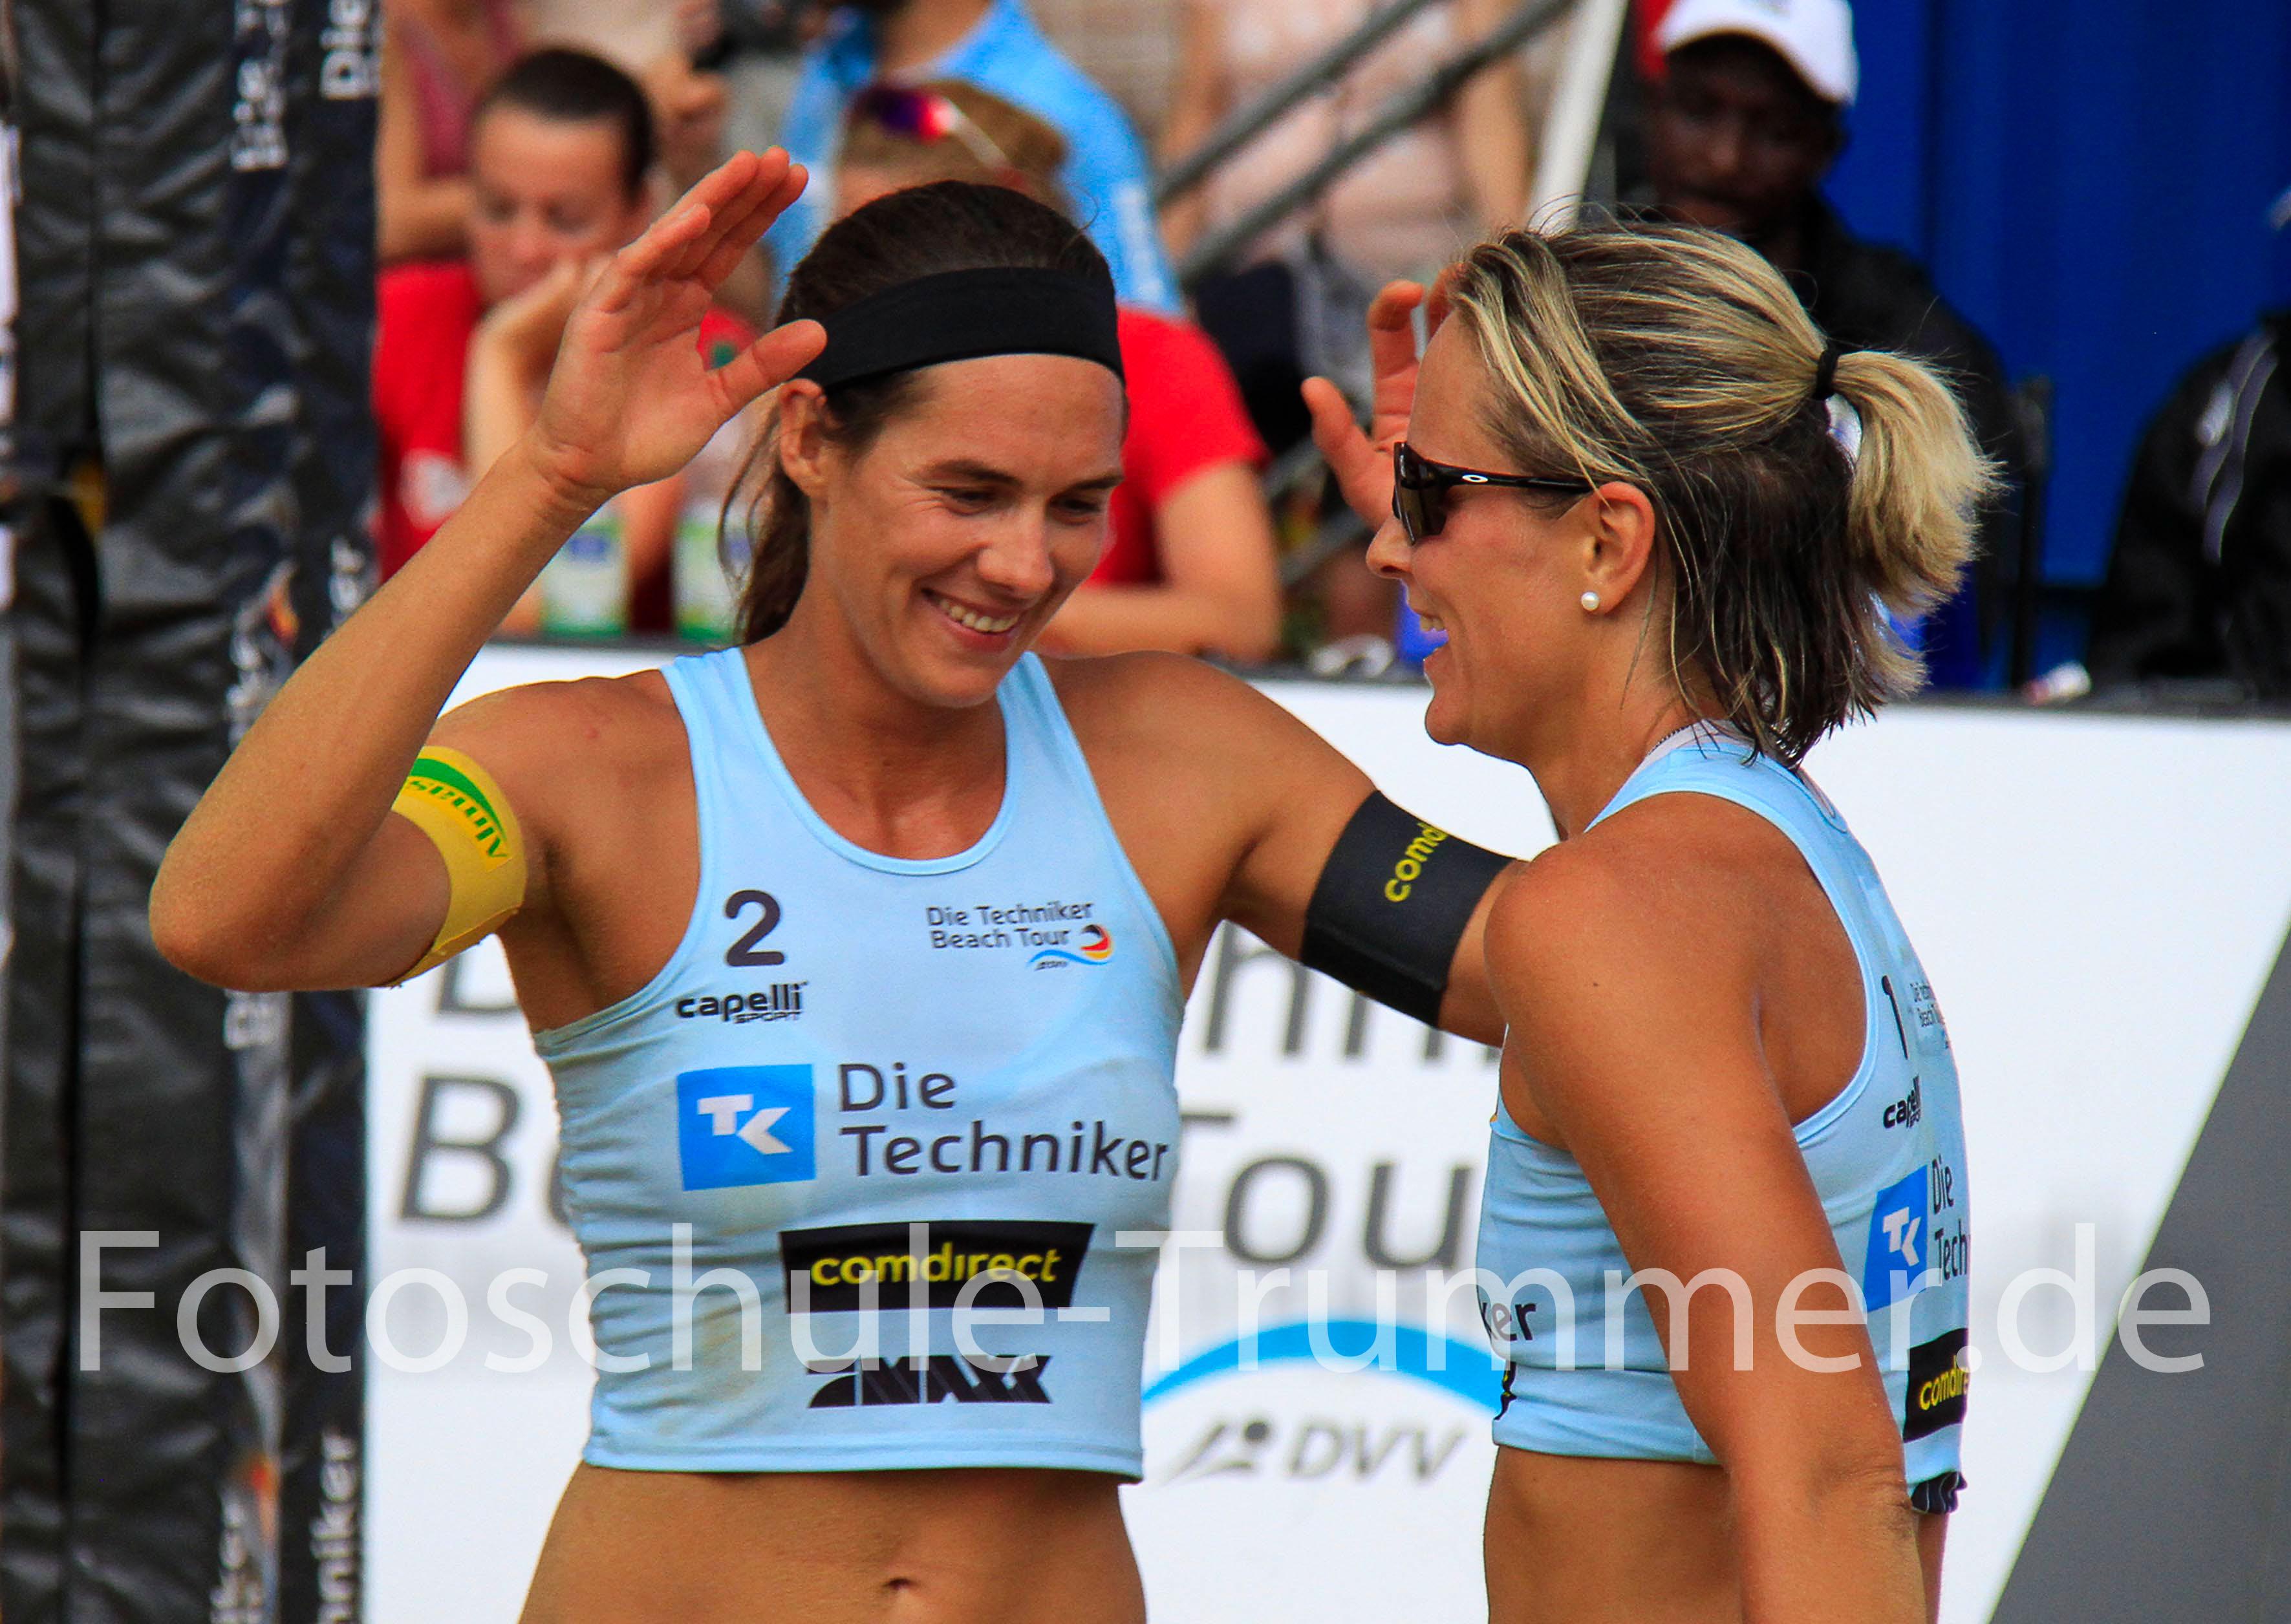 Beach Team Olympia siegerin Kira Wolkenhorst und Elena Kiesling